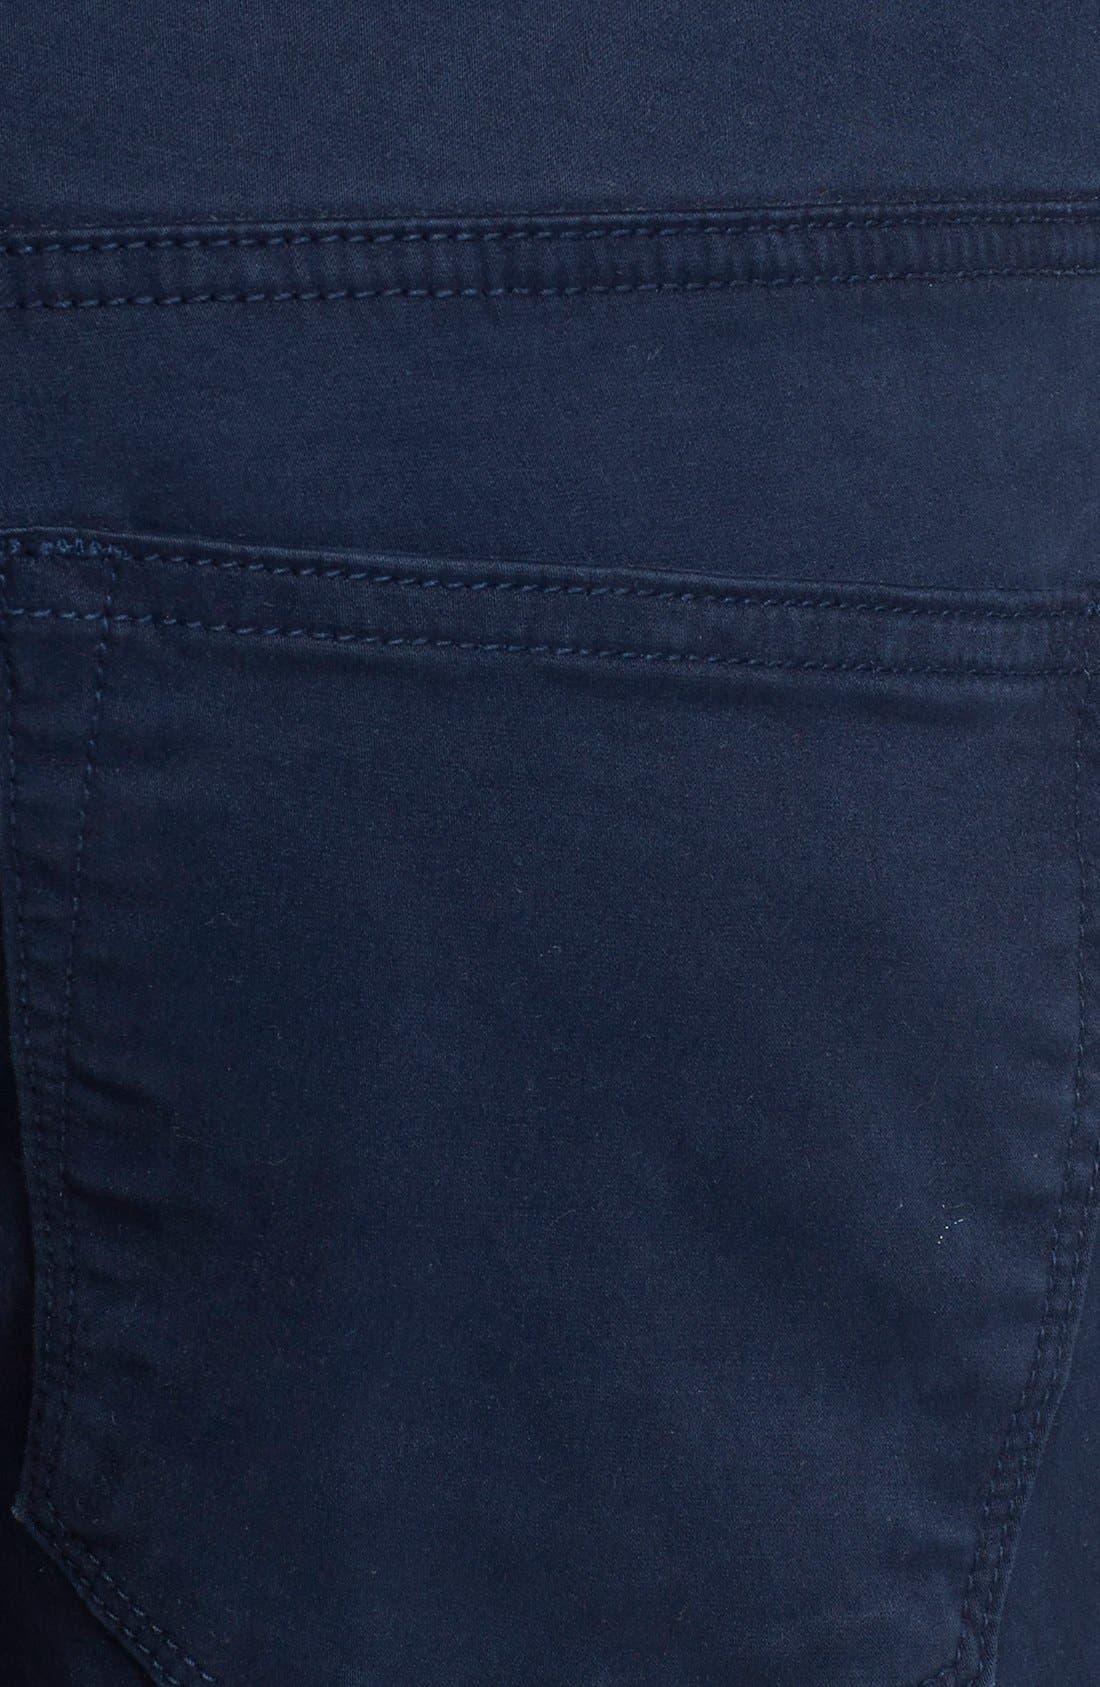 'Kane' Slim Fit Cotton Twill Pants,                             Alternate thumbnail 35, color,